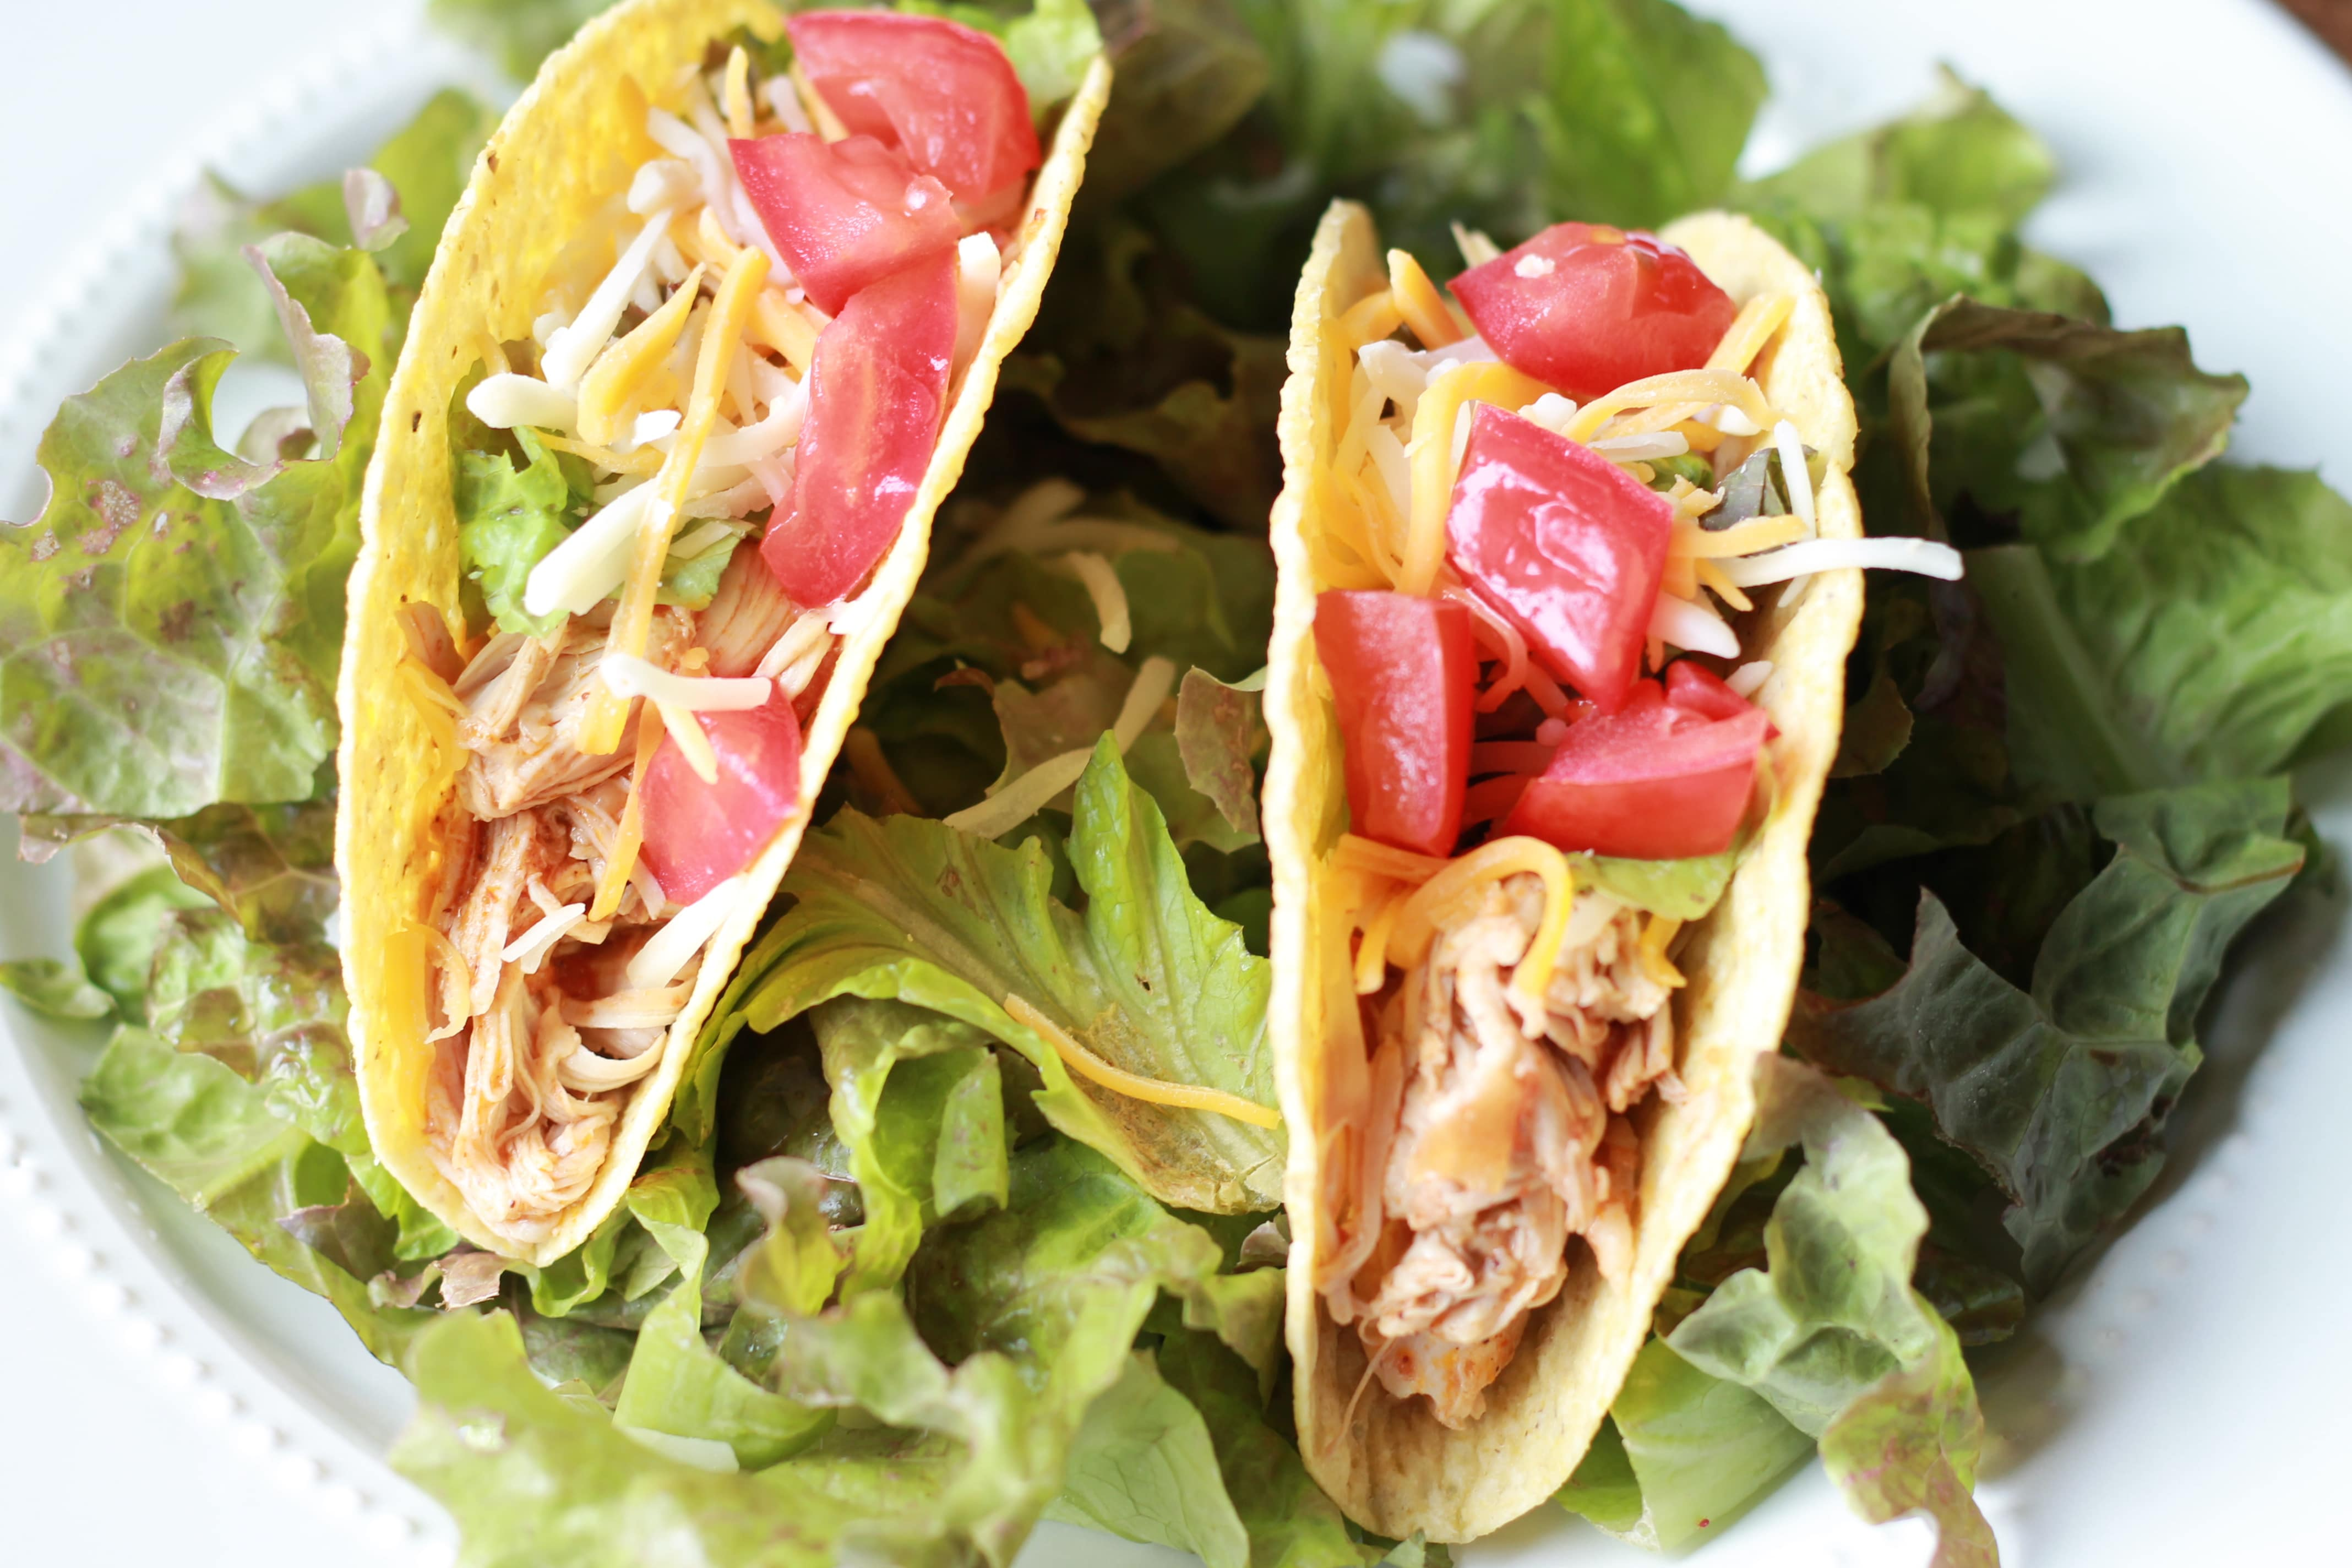 Slow Cook Enchilada Chicken Tacos